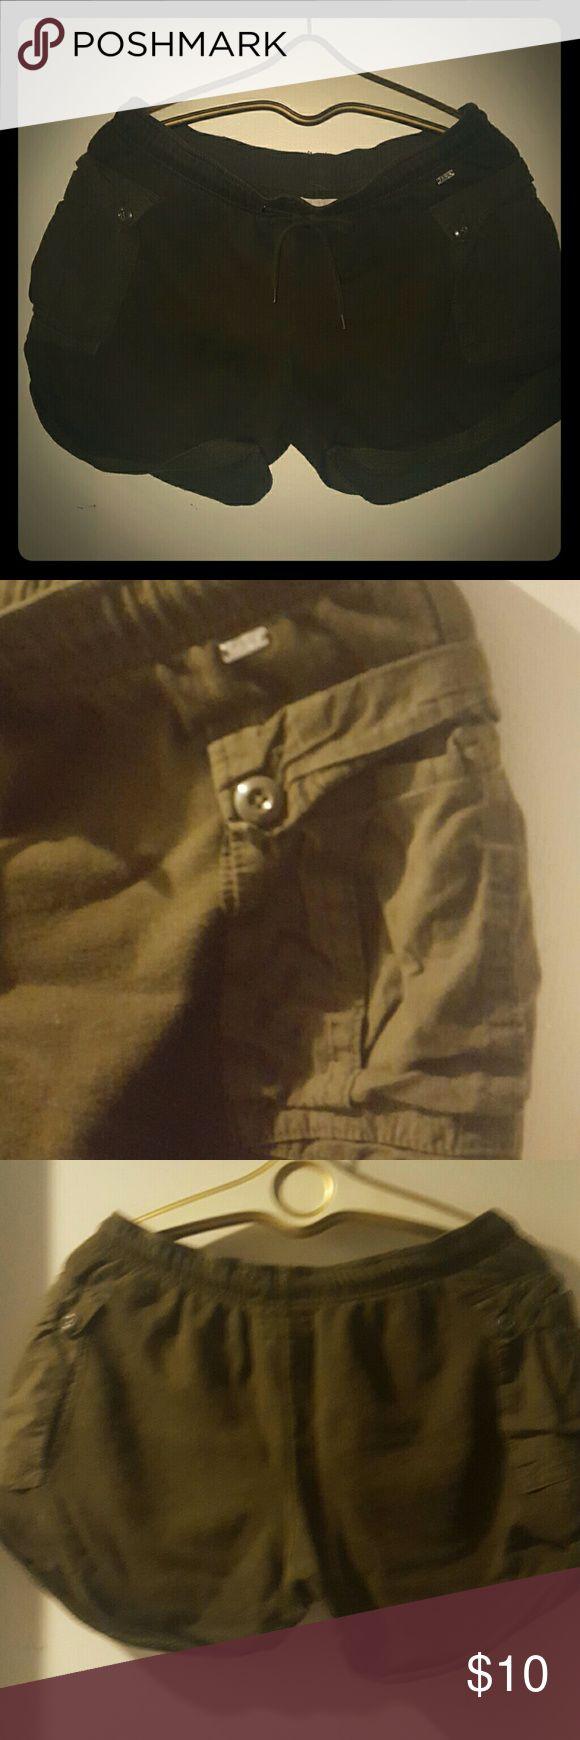 Cargo shorts Ralph Lauren Demin and Supply shorts Demin &Supply  Shorts Cargos